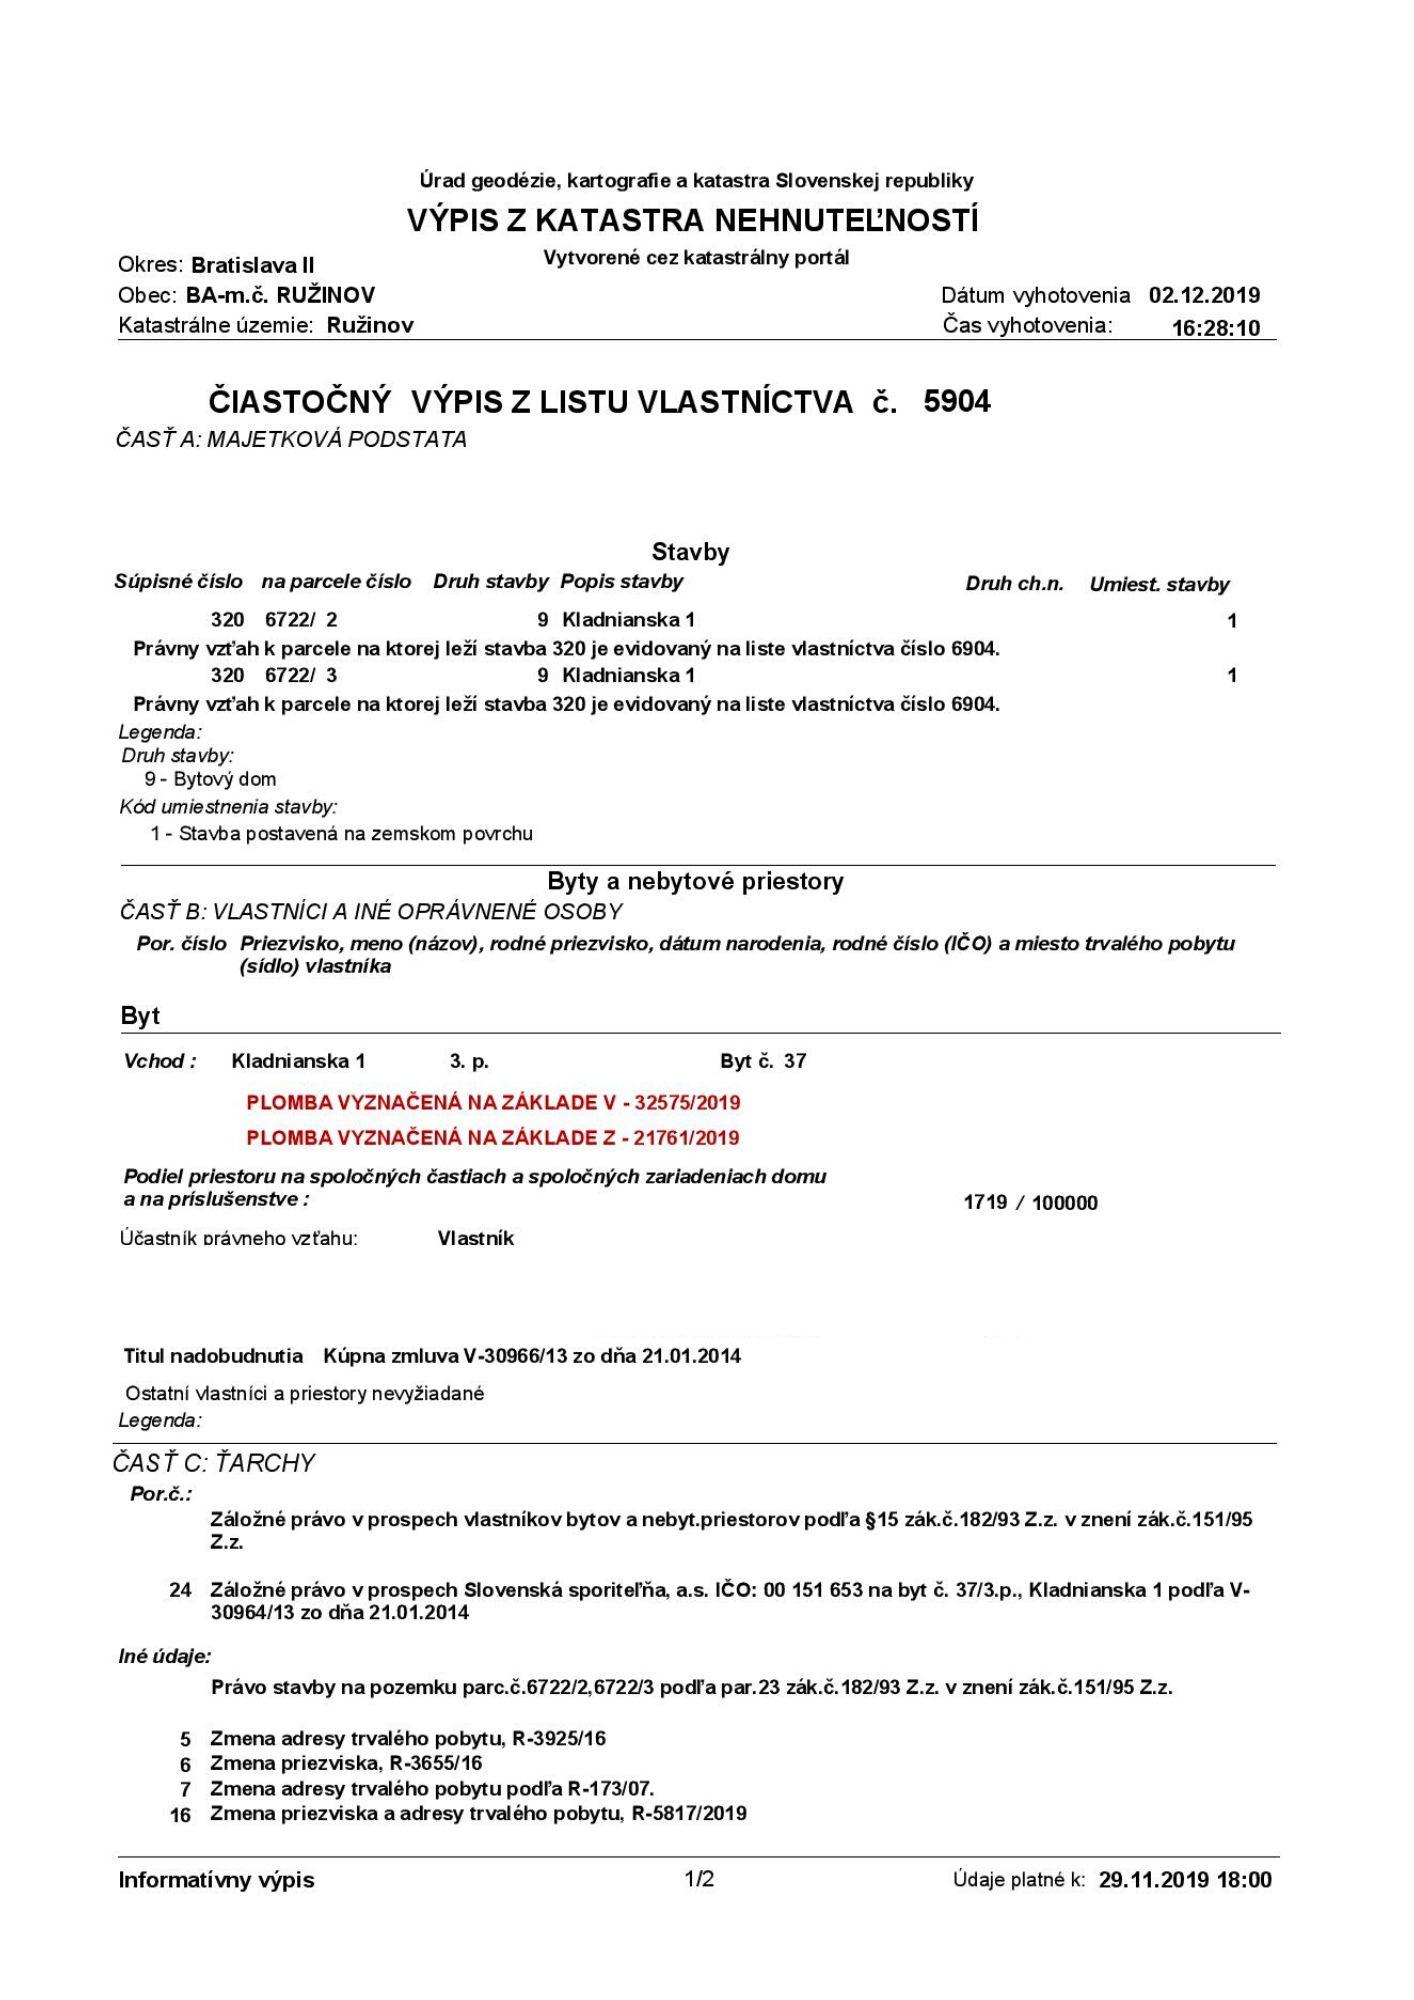 list vlastníctva výpis z katastra plomba